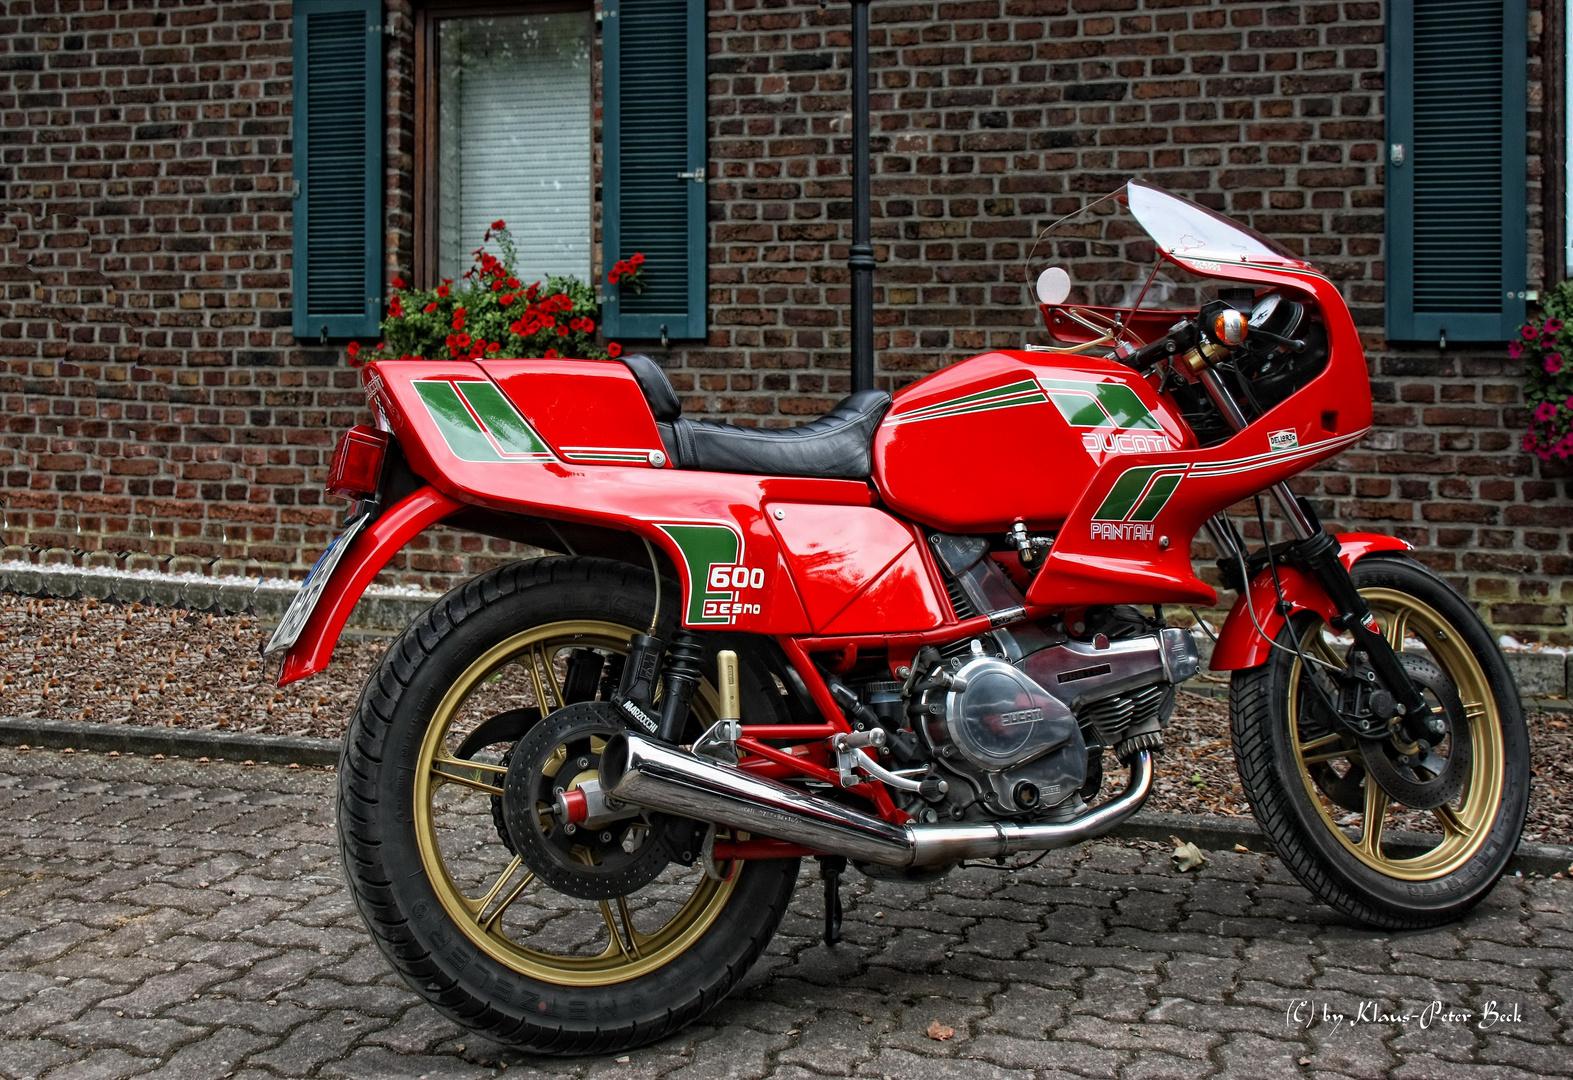 ducati pantah 600 ss desmo foto bild autos zweir der motorr der motorrad legenden. Black Bedroom Furniture Sets. Home Design Ideas